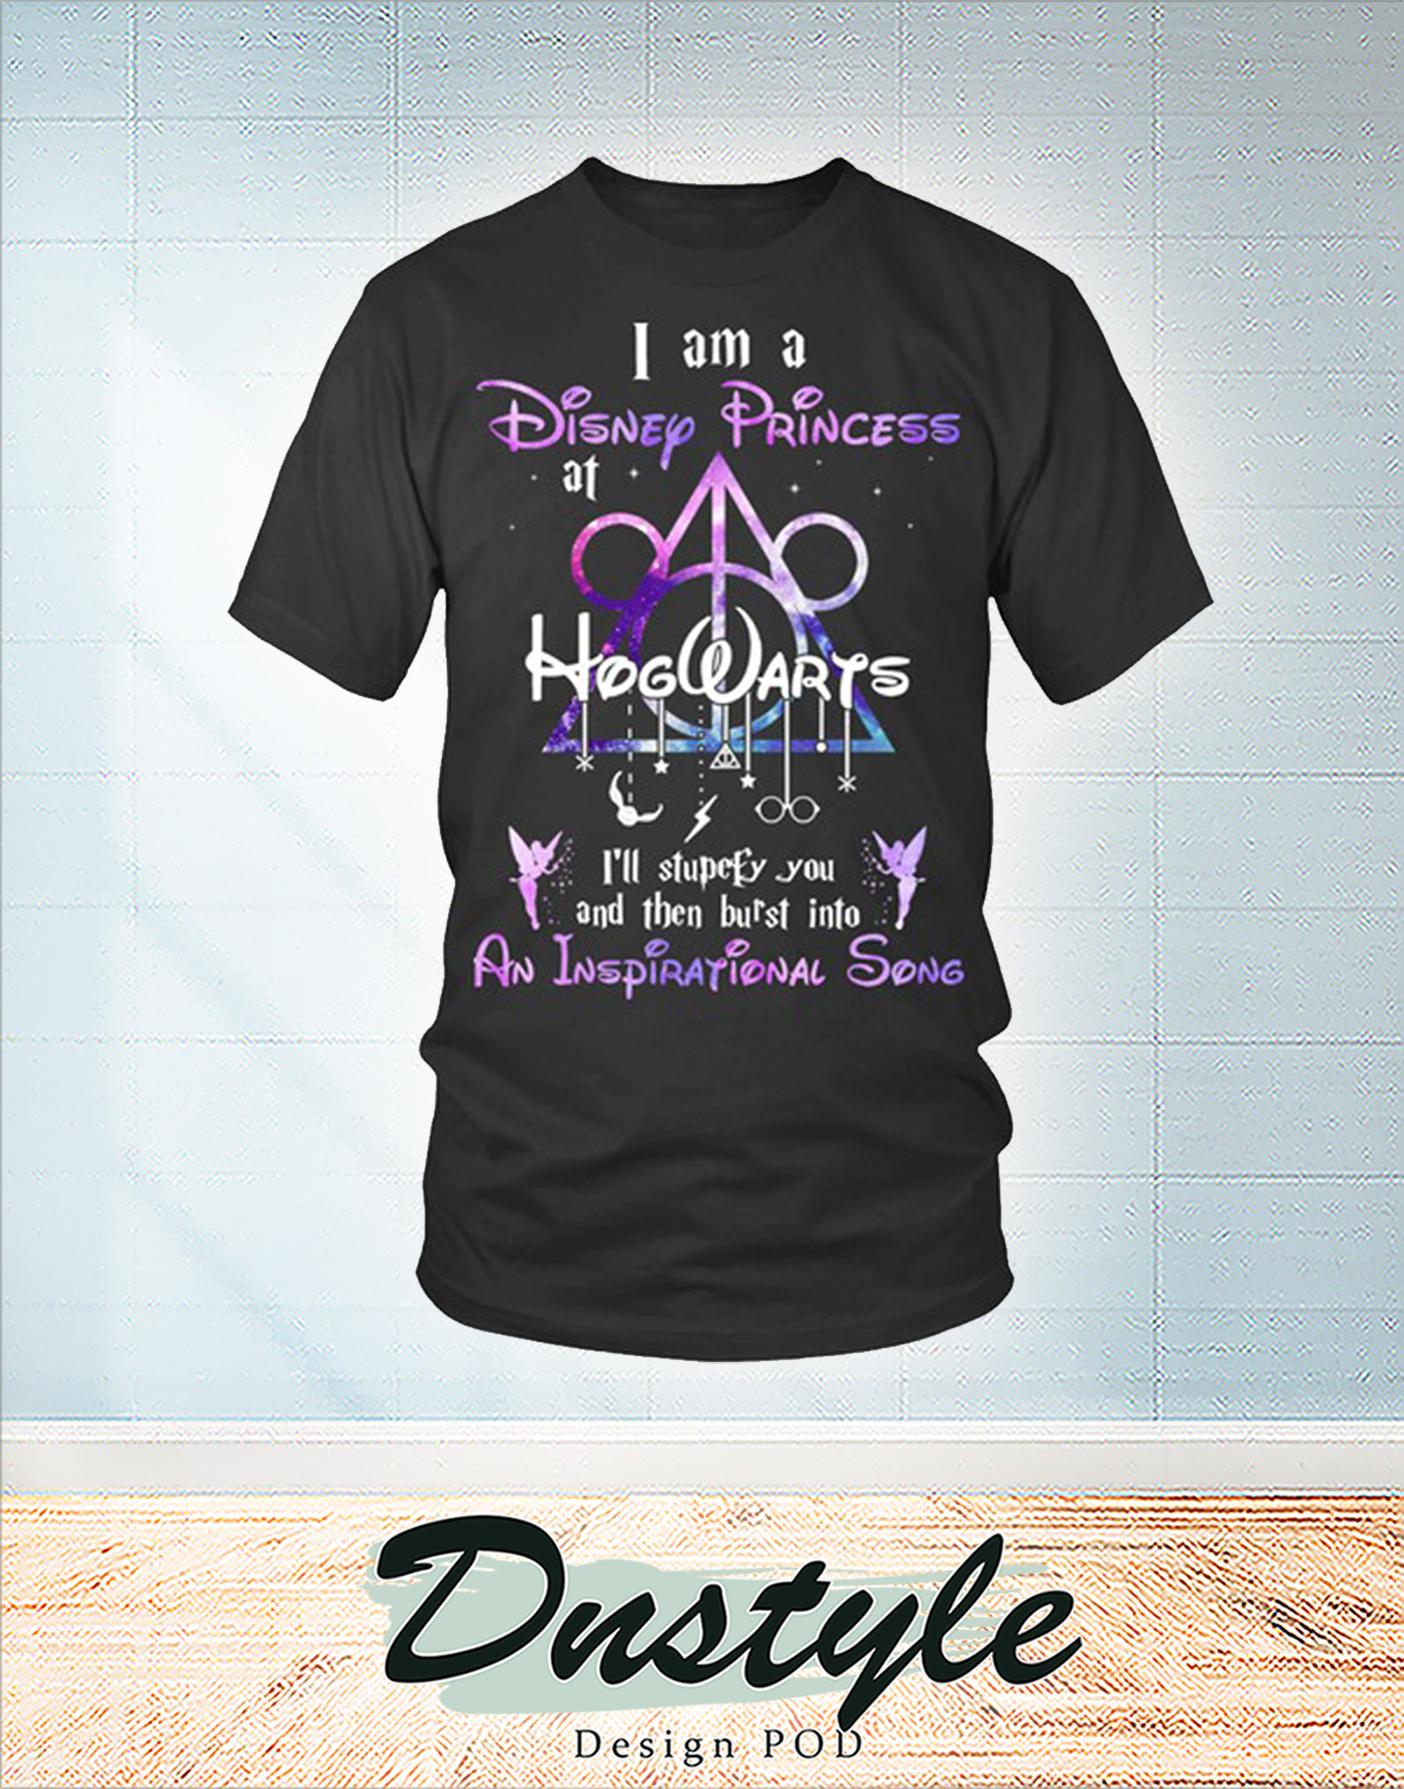 I am a disney princess at hogwarts shirt